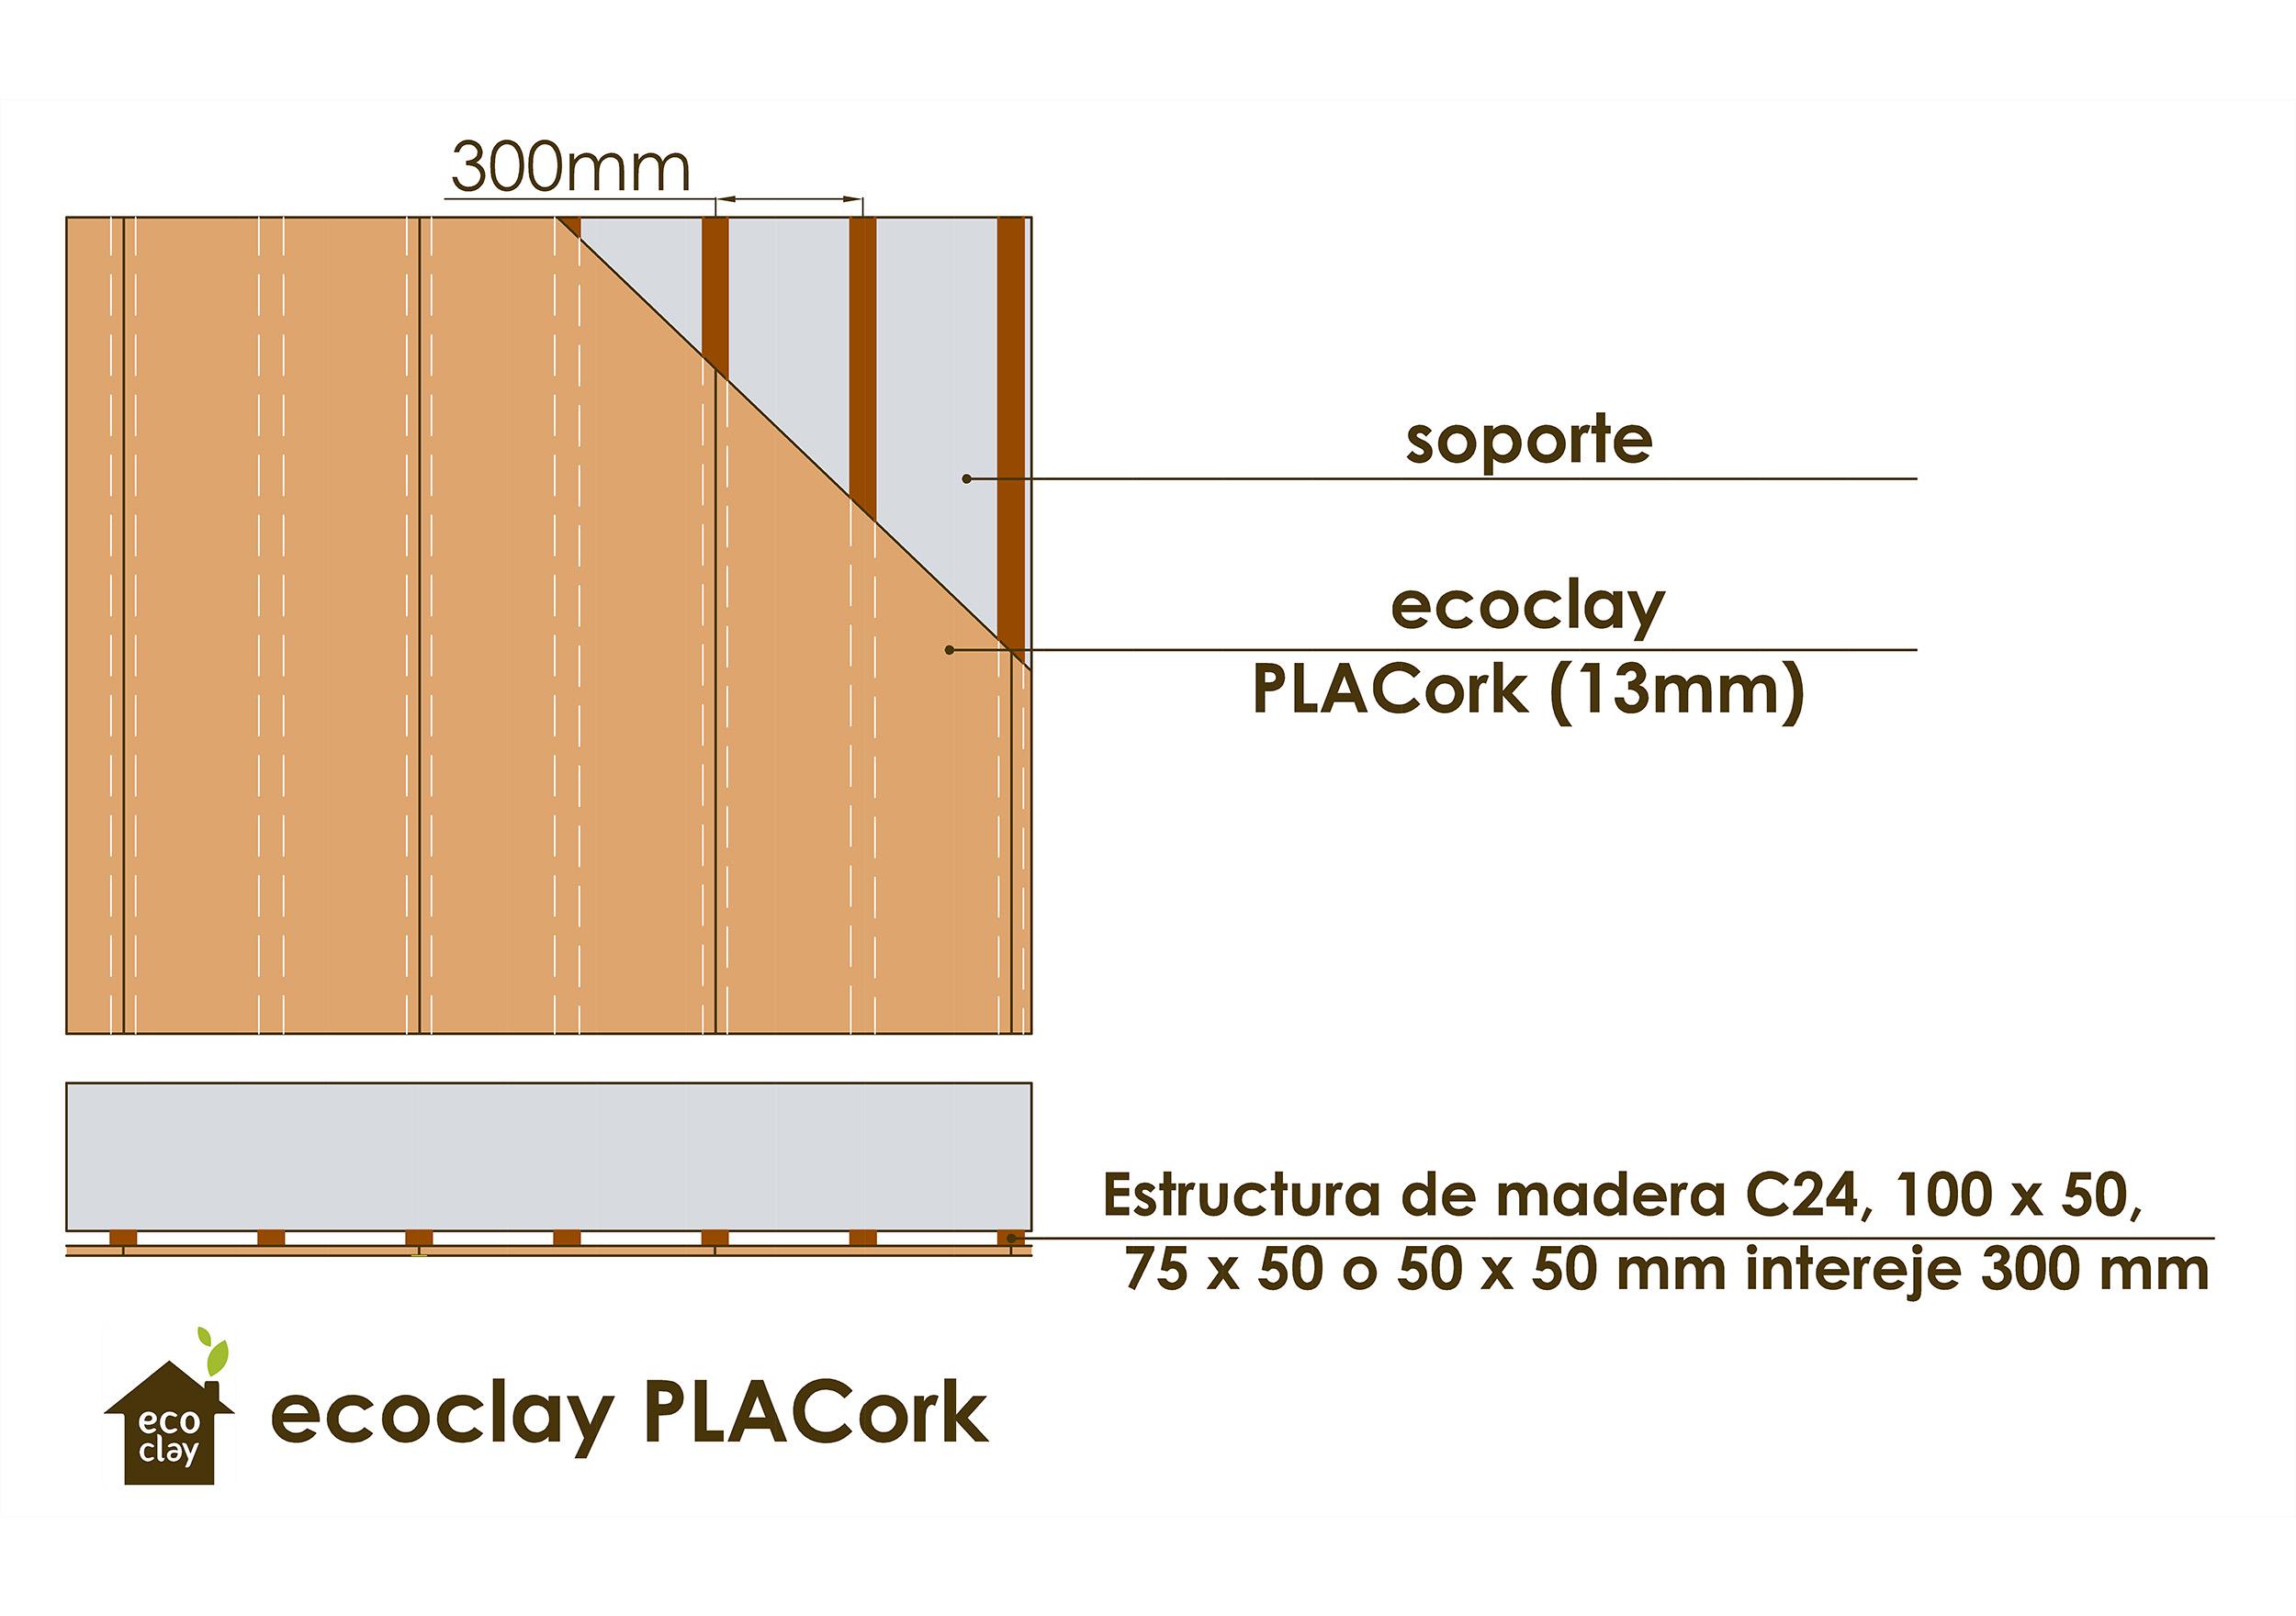 ecoclayPLACork, vistas